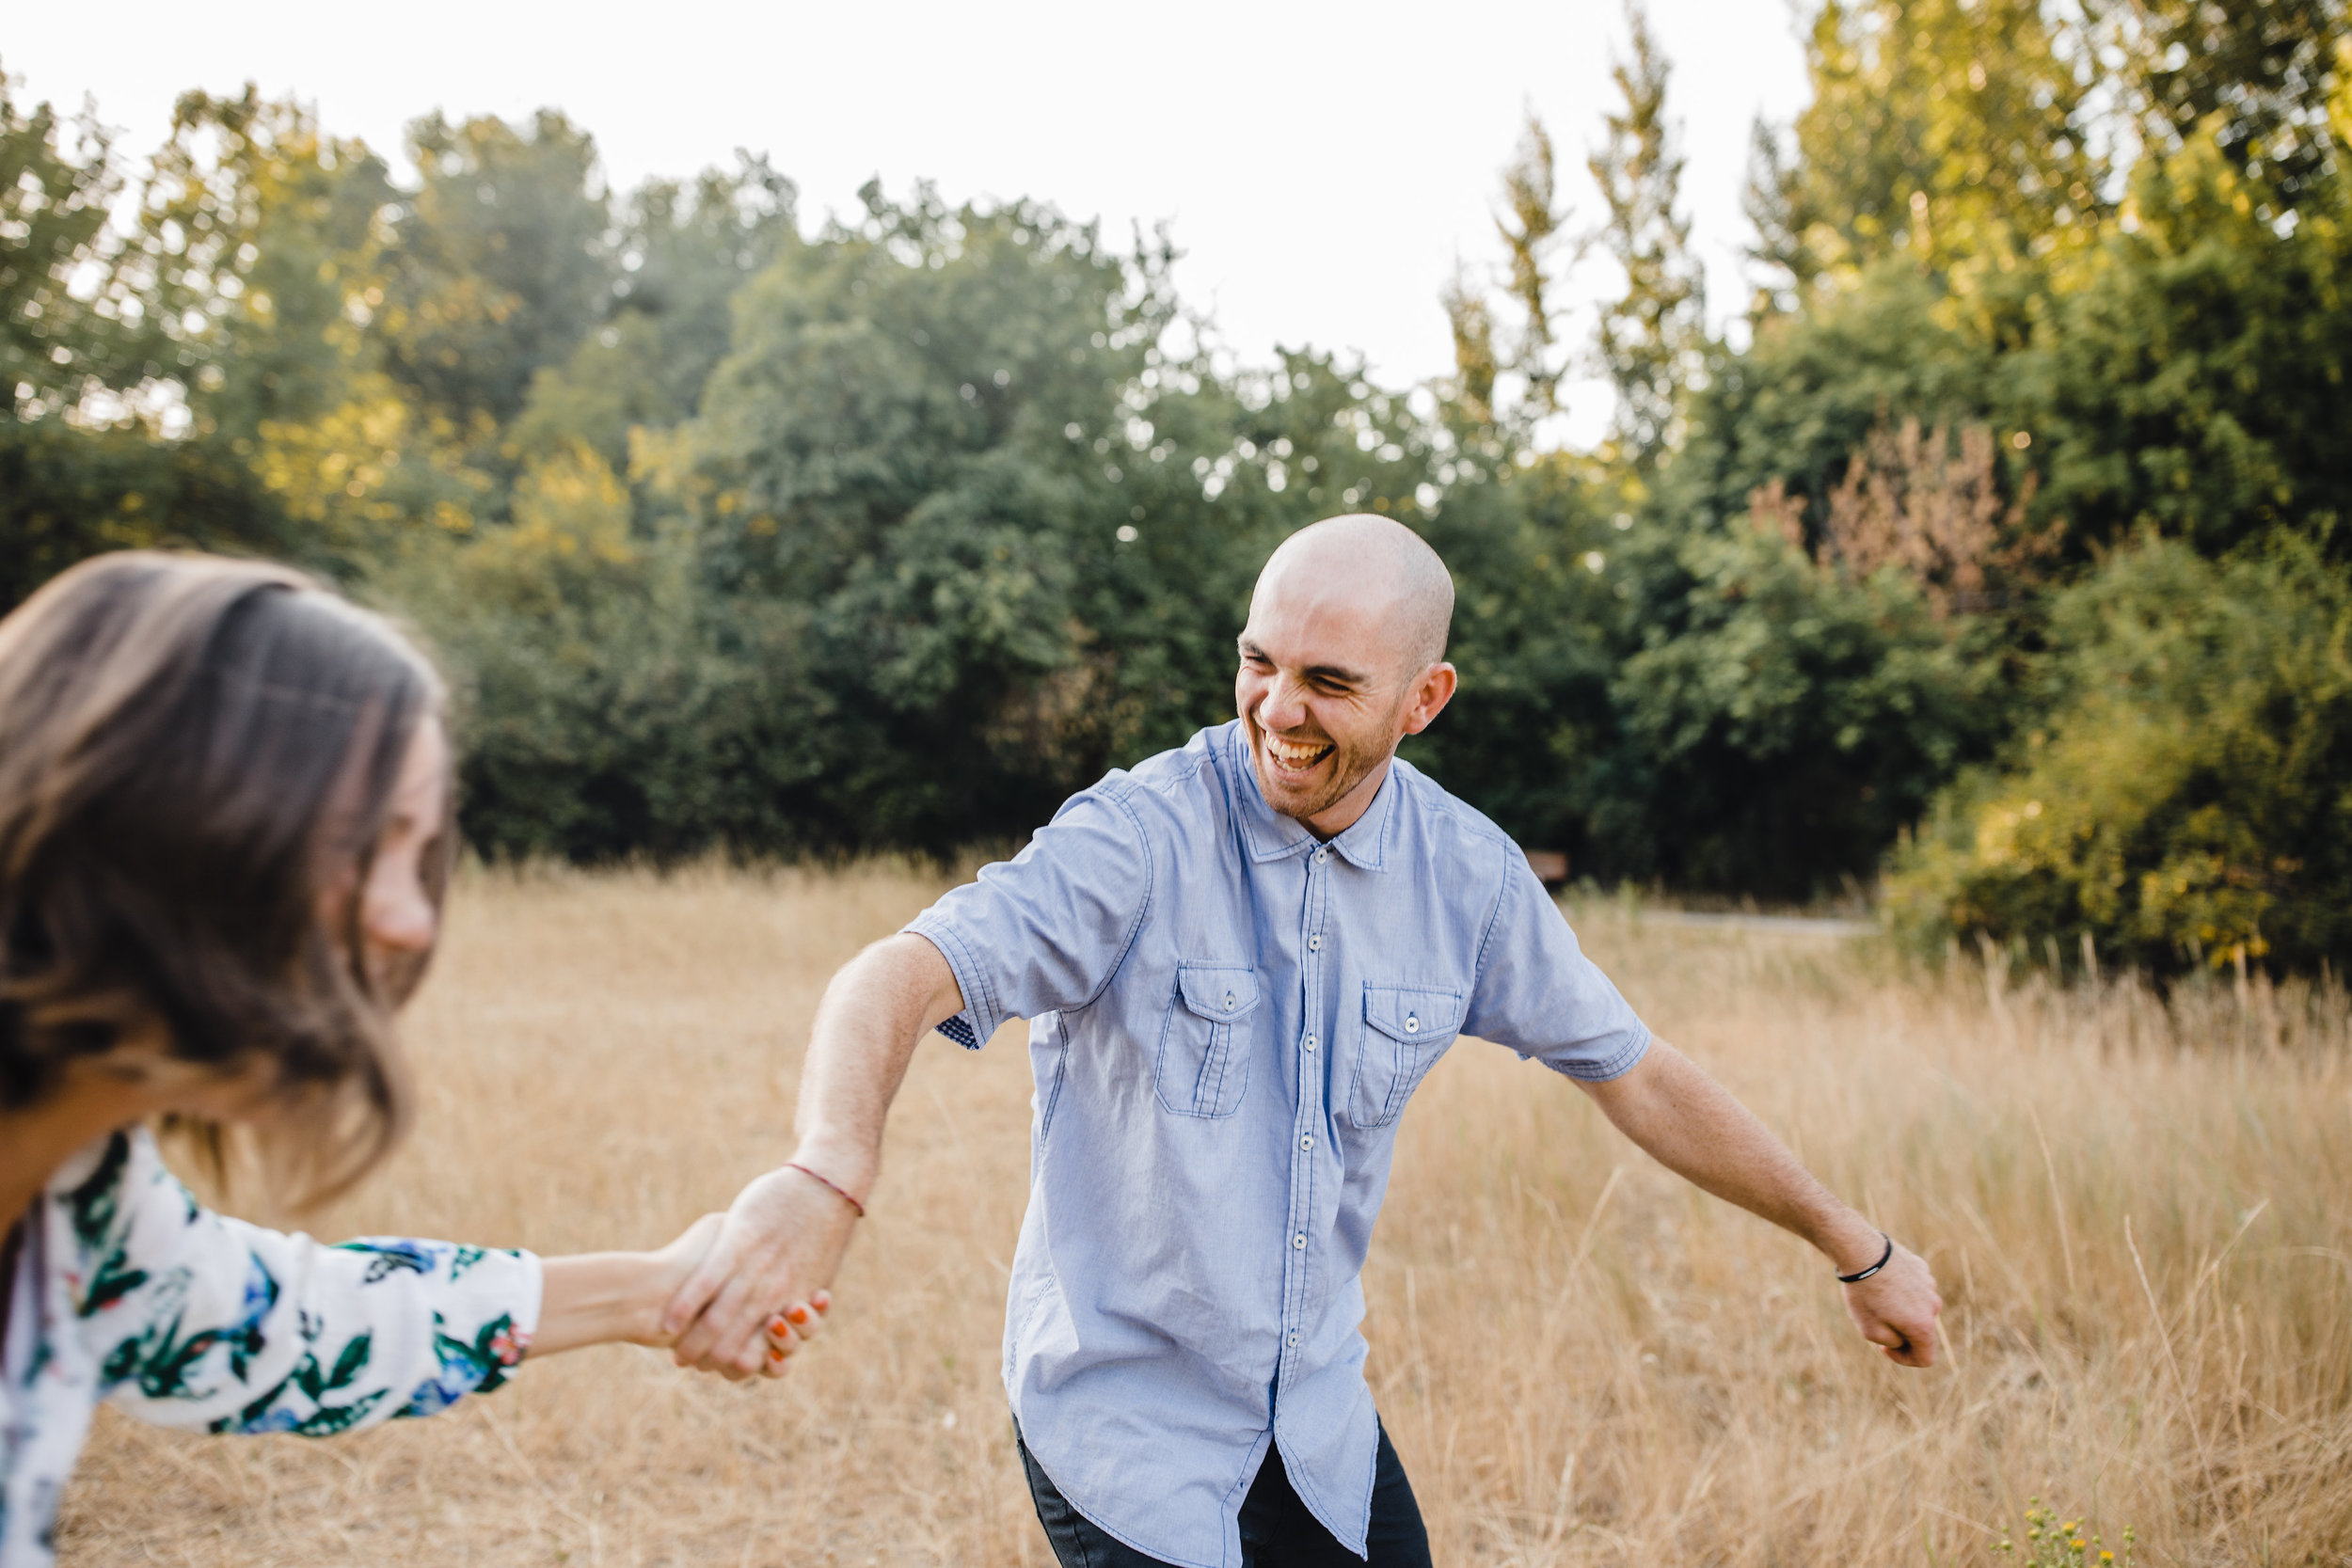 couples photographer in logan utah walking laughing spinning holding hands